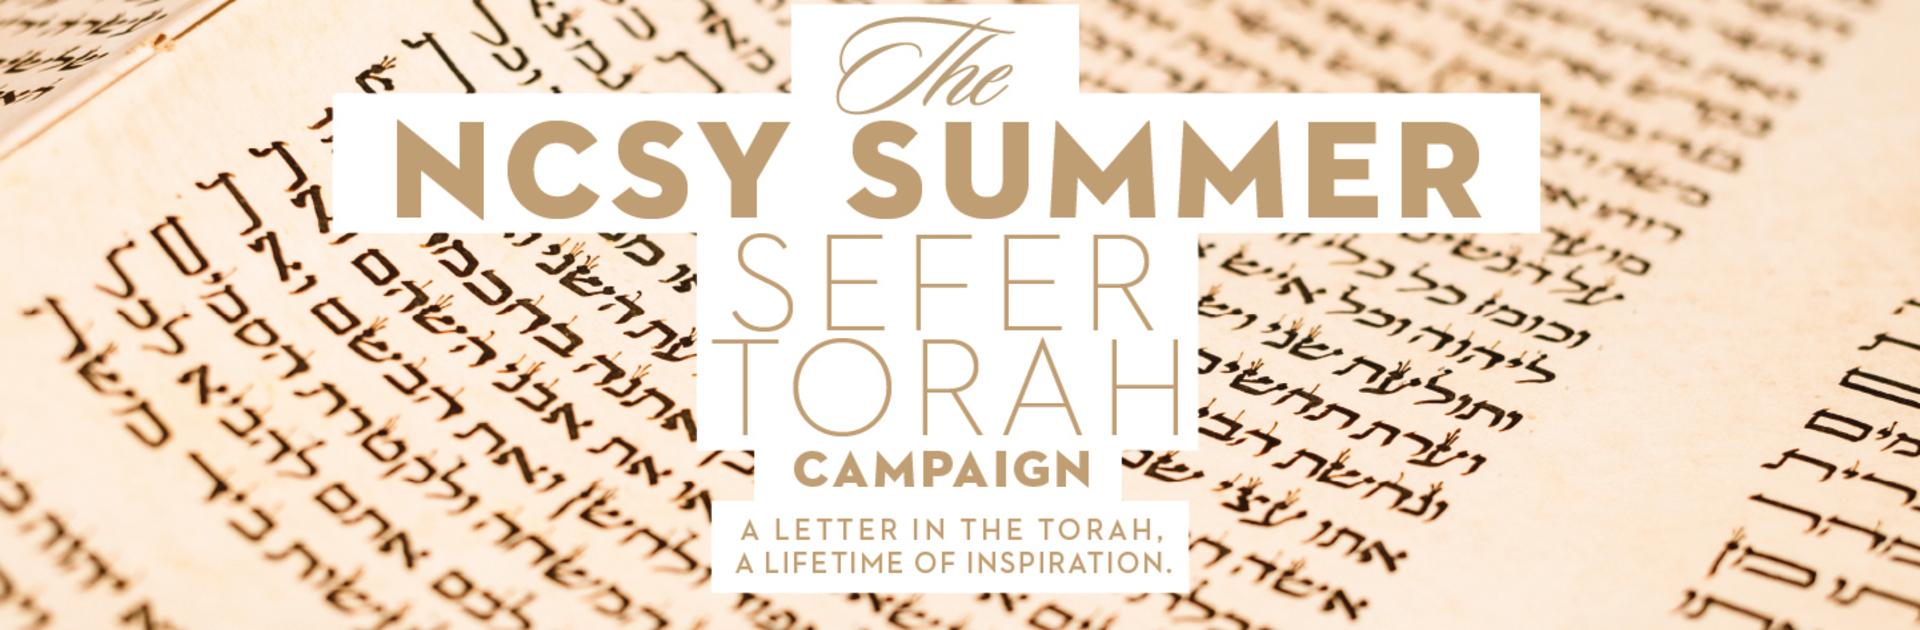 Sefer Torah image